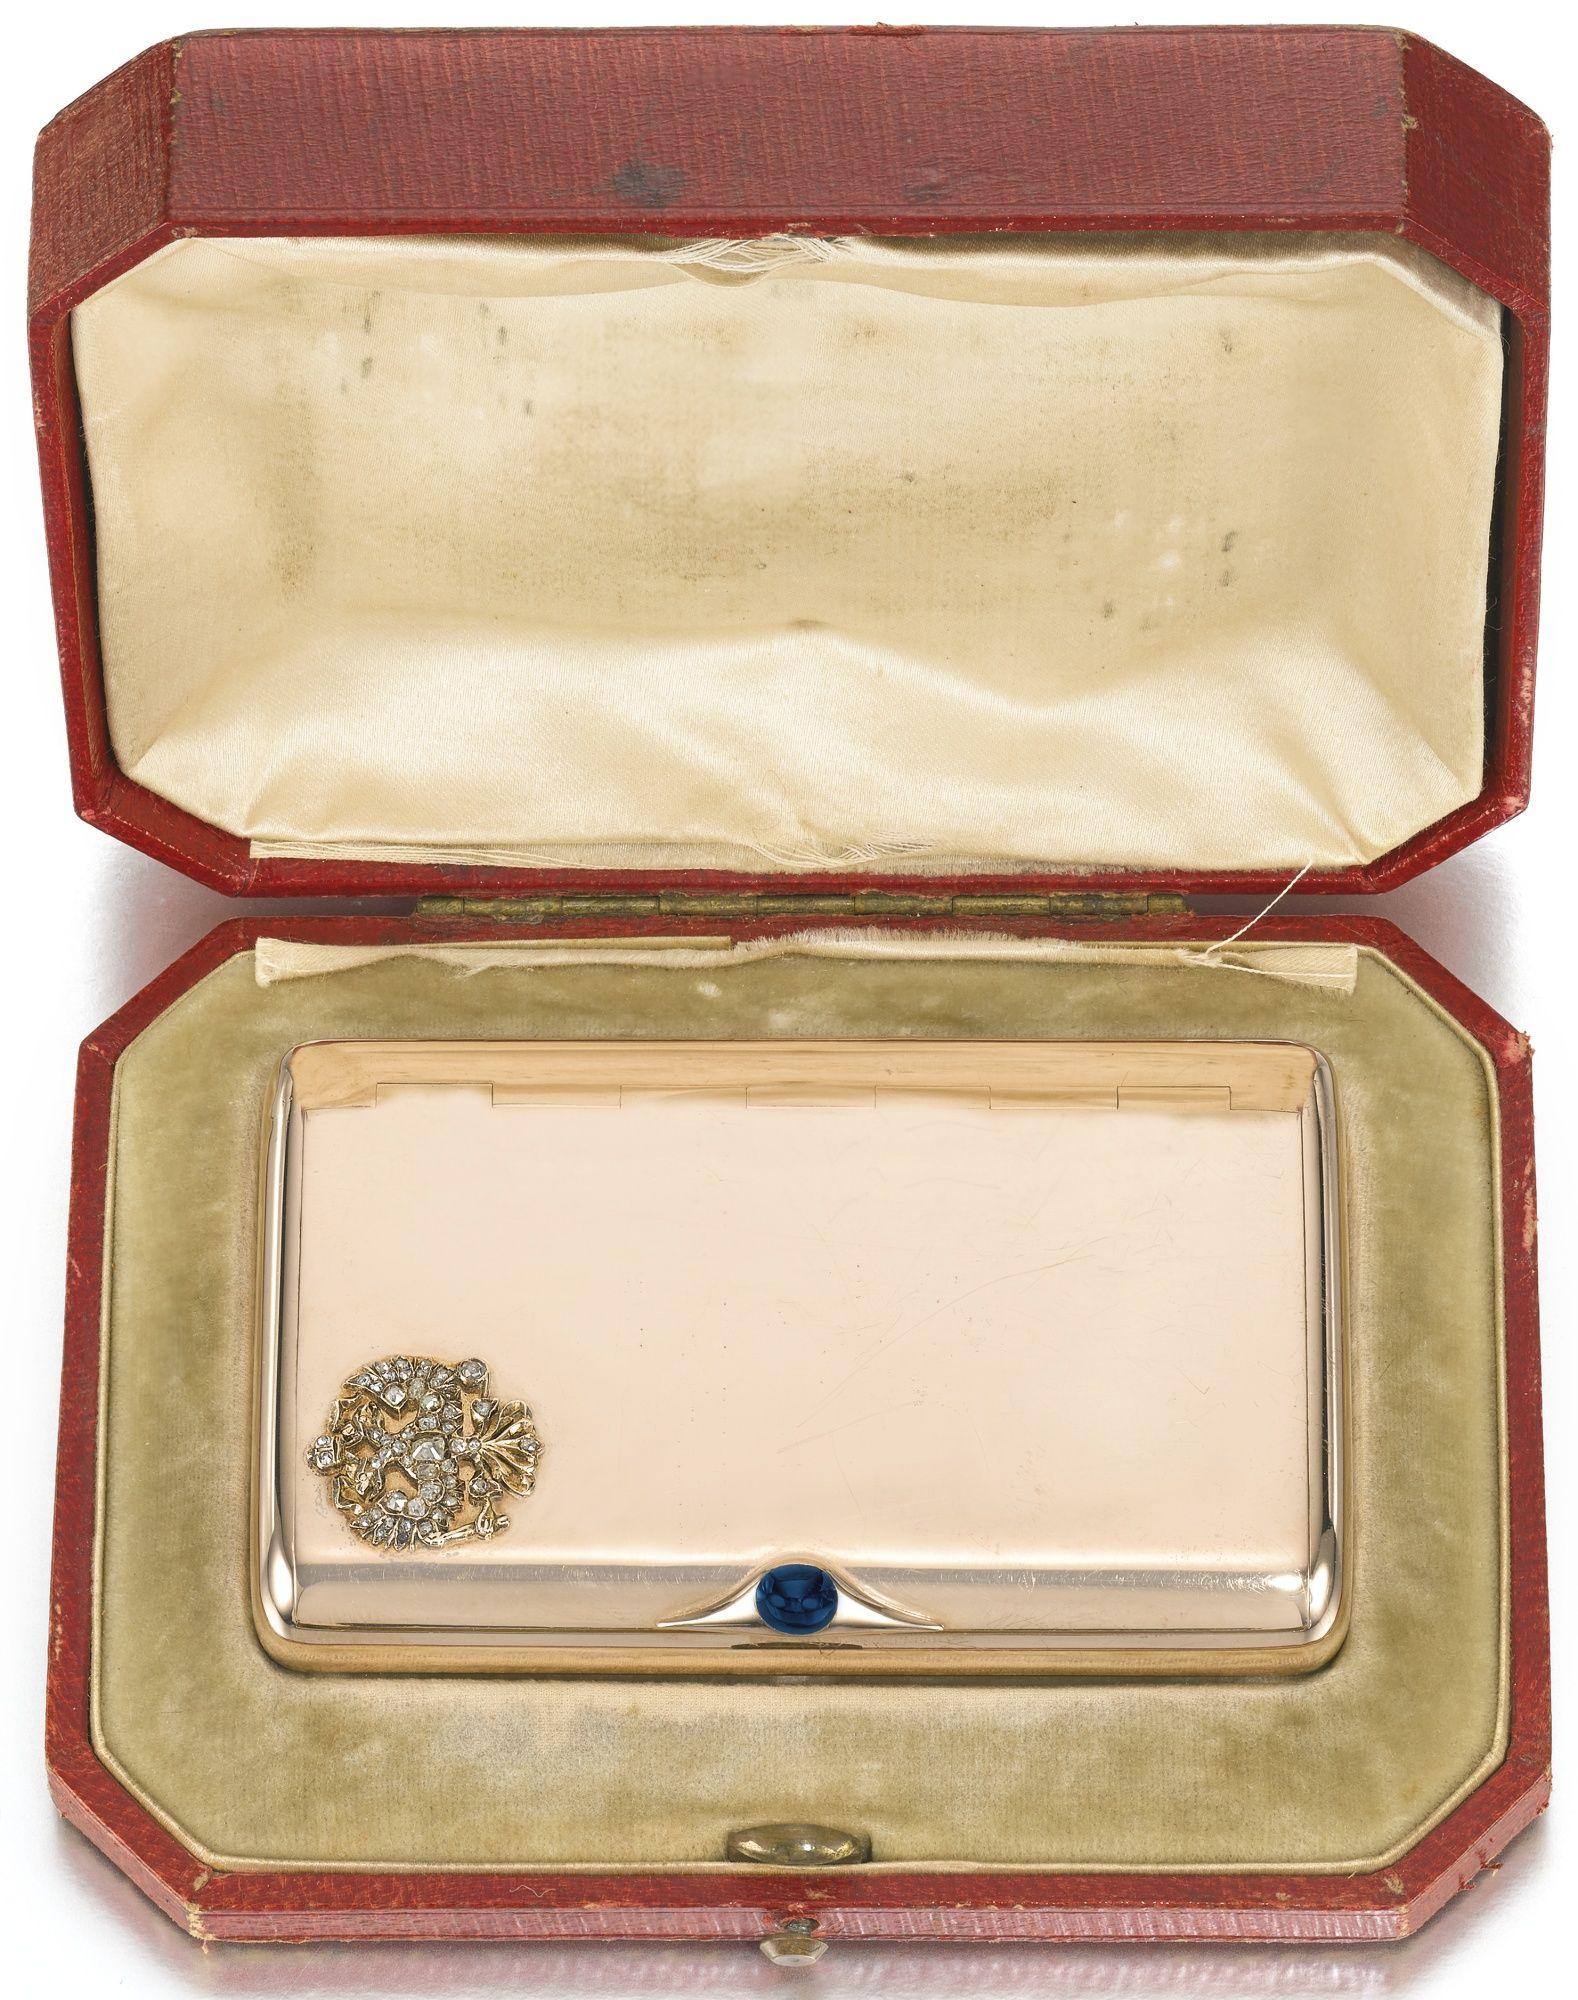 An Imperial Presentation Fabergé jewelled gold cigarette case, workmaster Gabriel Niukkanen/Nykänen, St Petersburg, circa 1895 | lot | Sotheby's